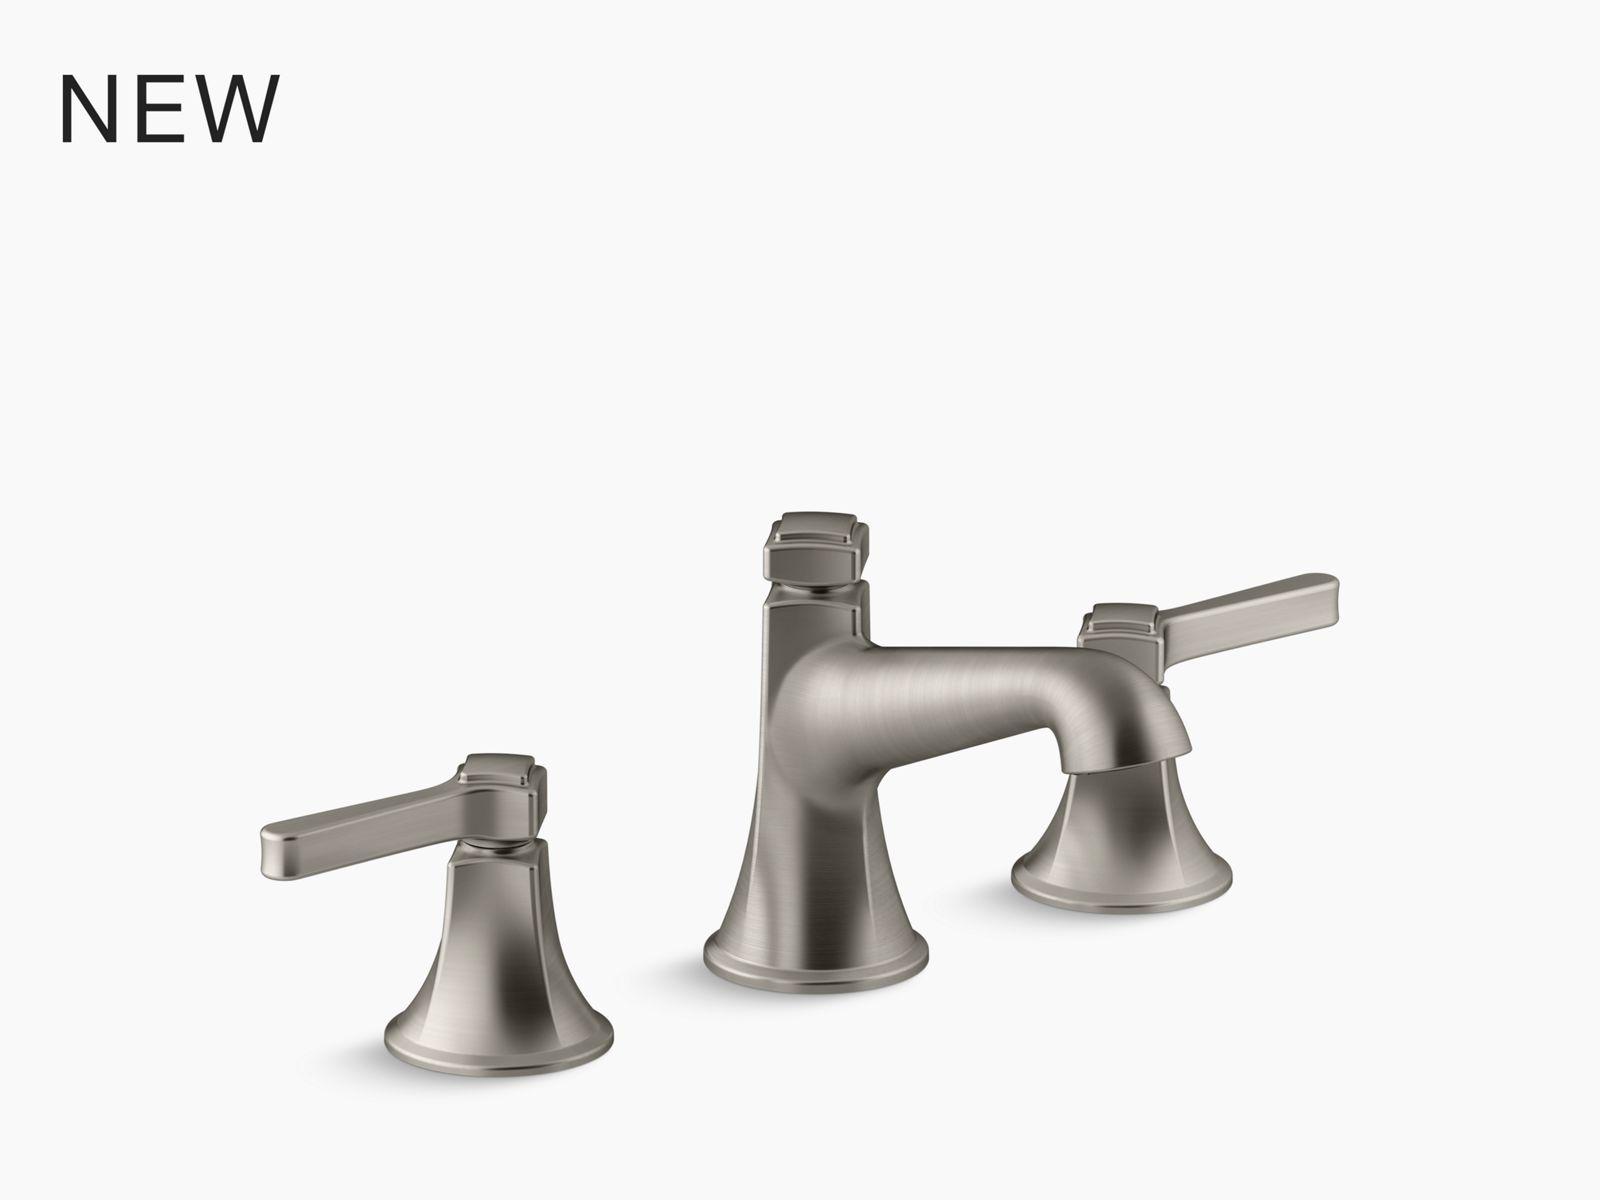 ealing single handle bathroom sink faucet